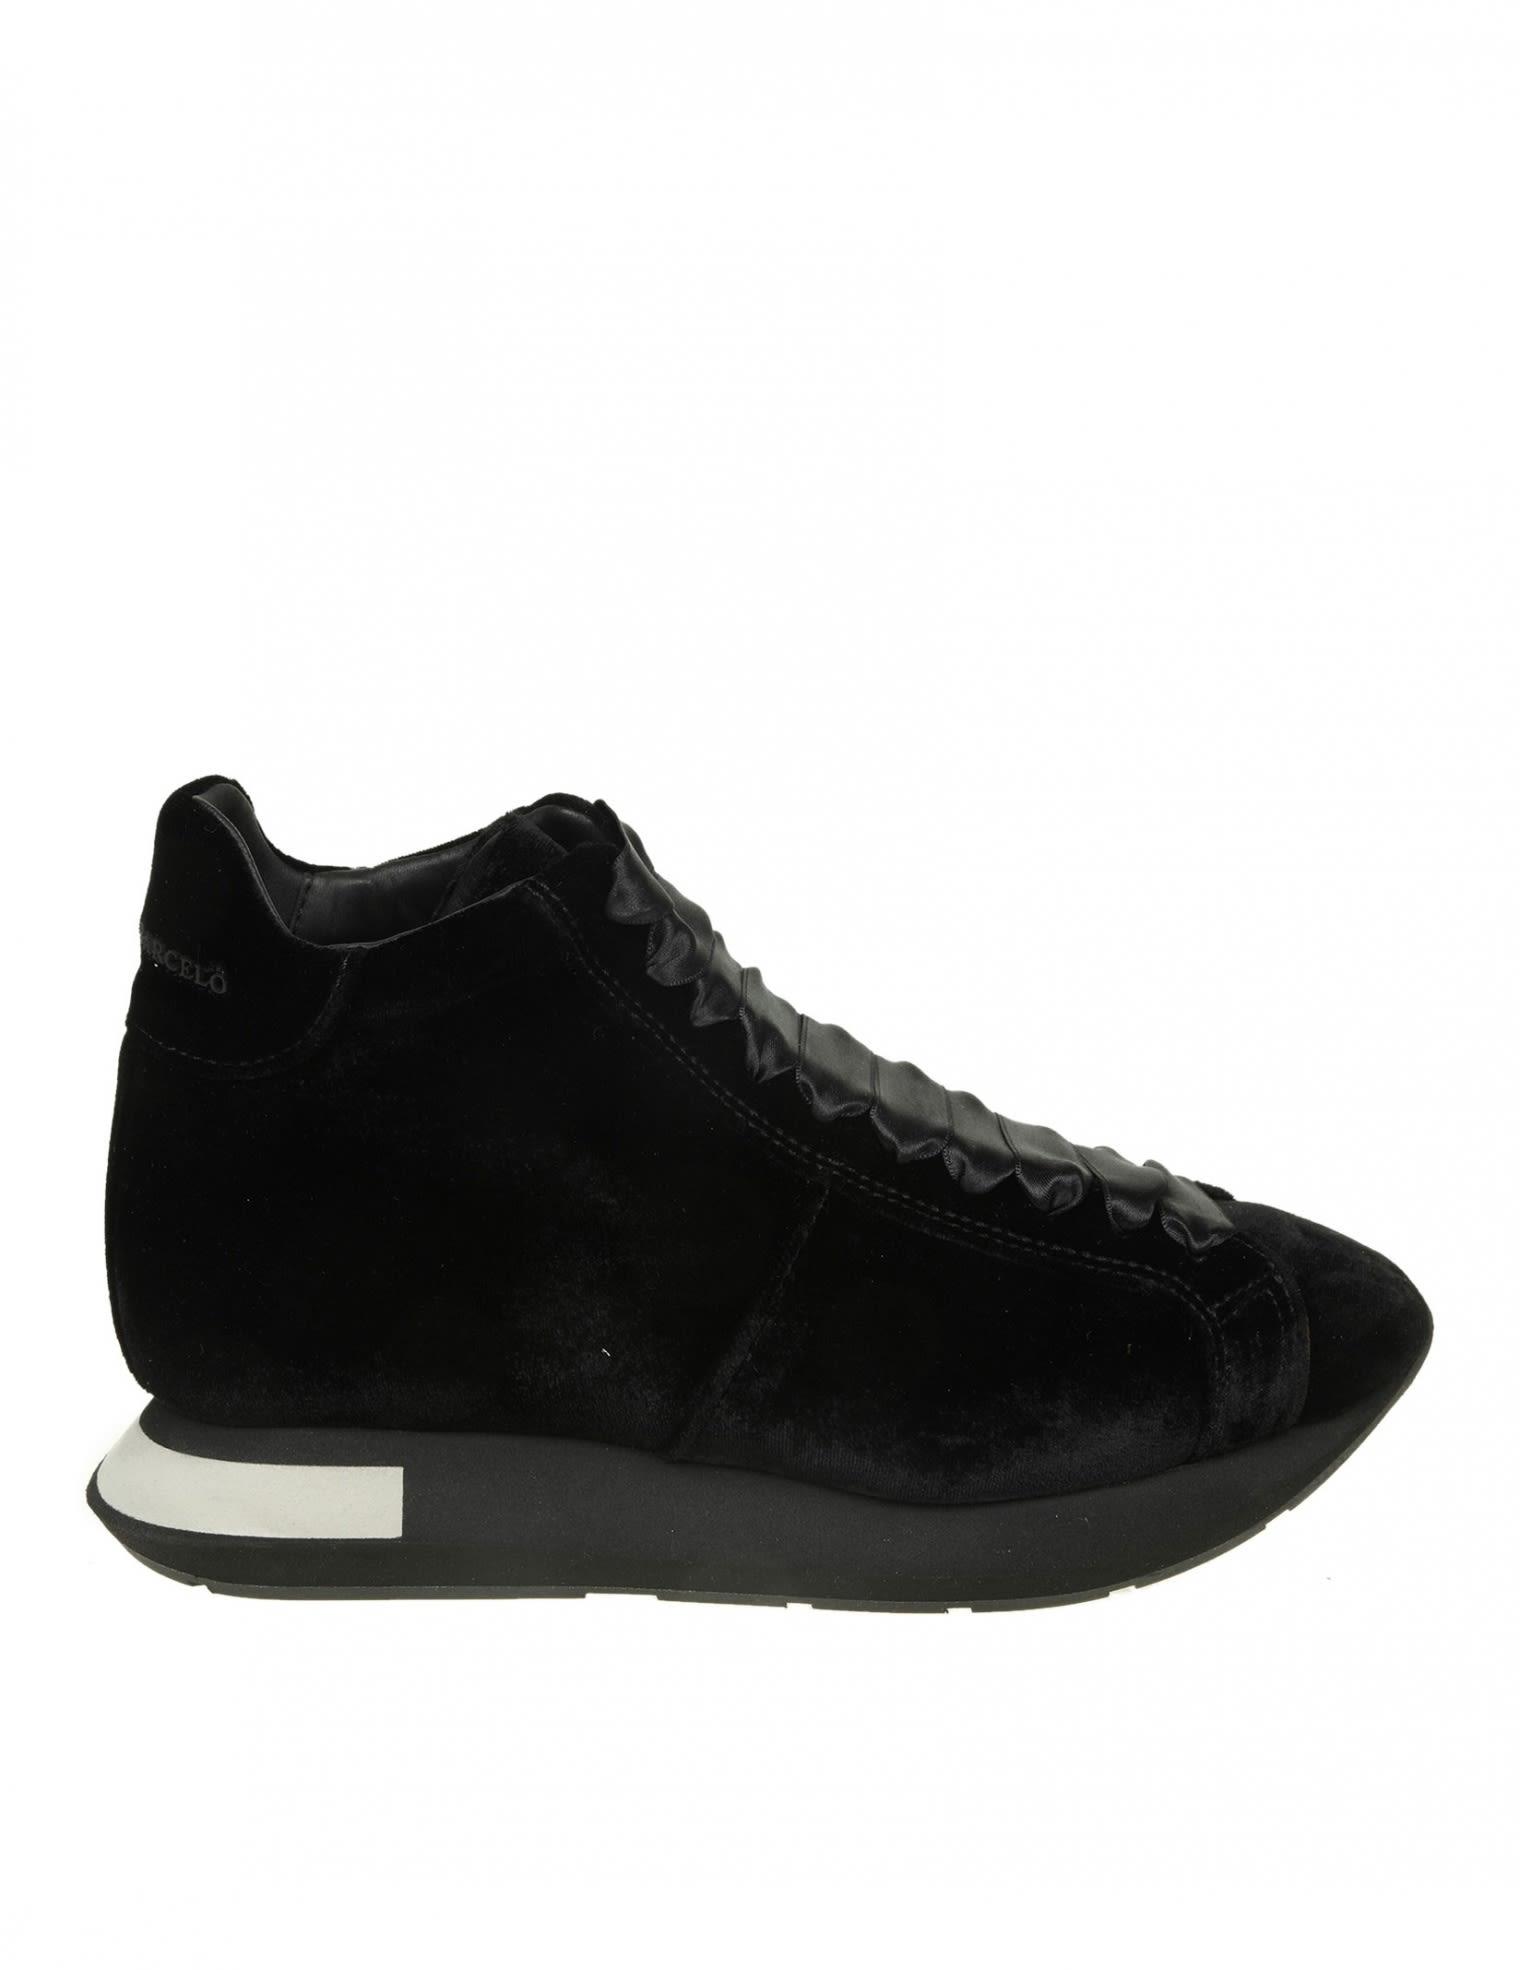 Manuel Barcelo' Ankle Boot In Velvet Color Black